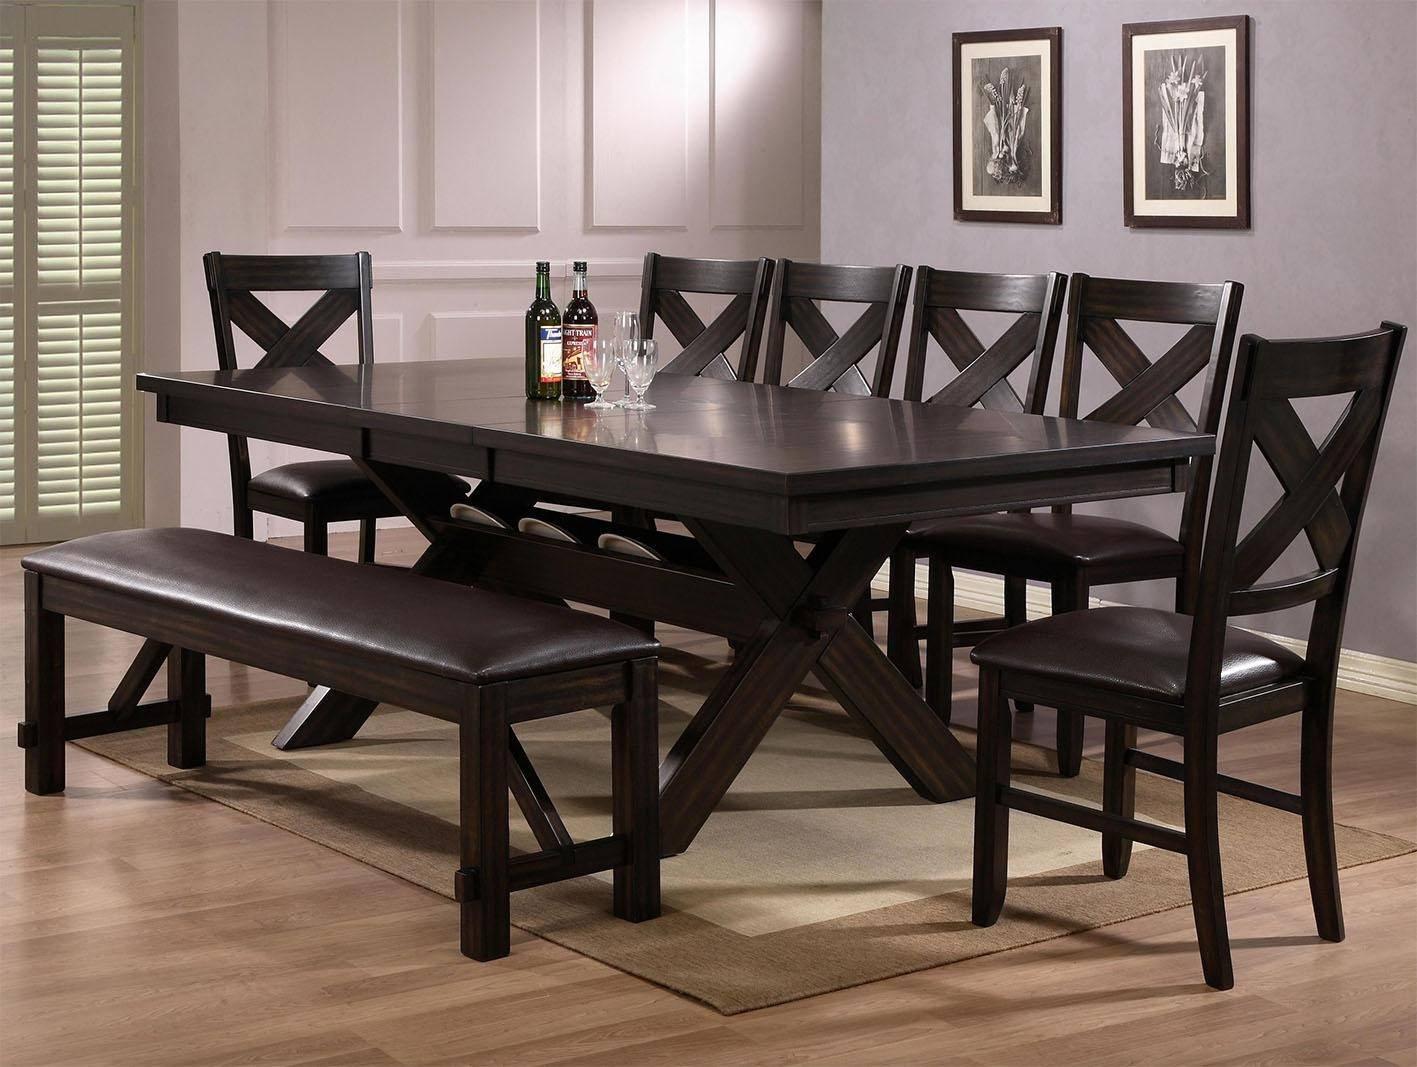 crown mark d2335 havana dining sets 6 pcs in black brown espresso faux leather